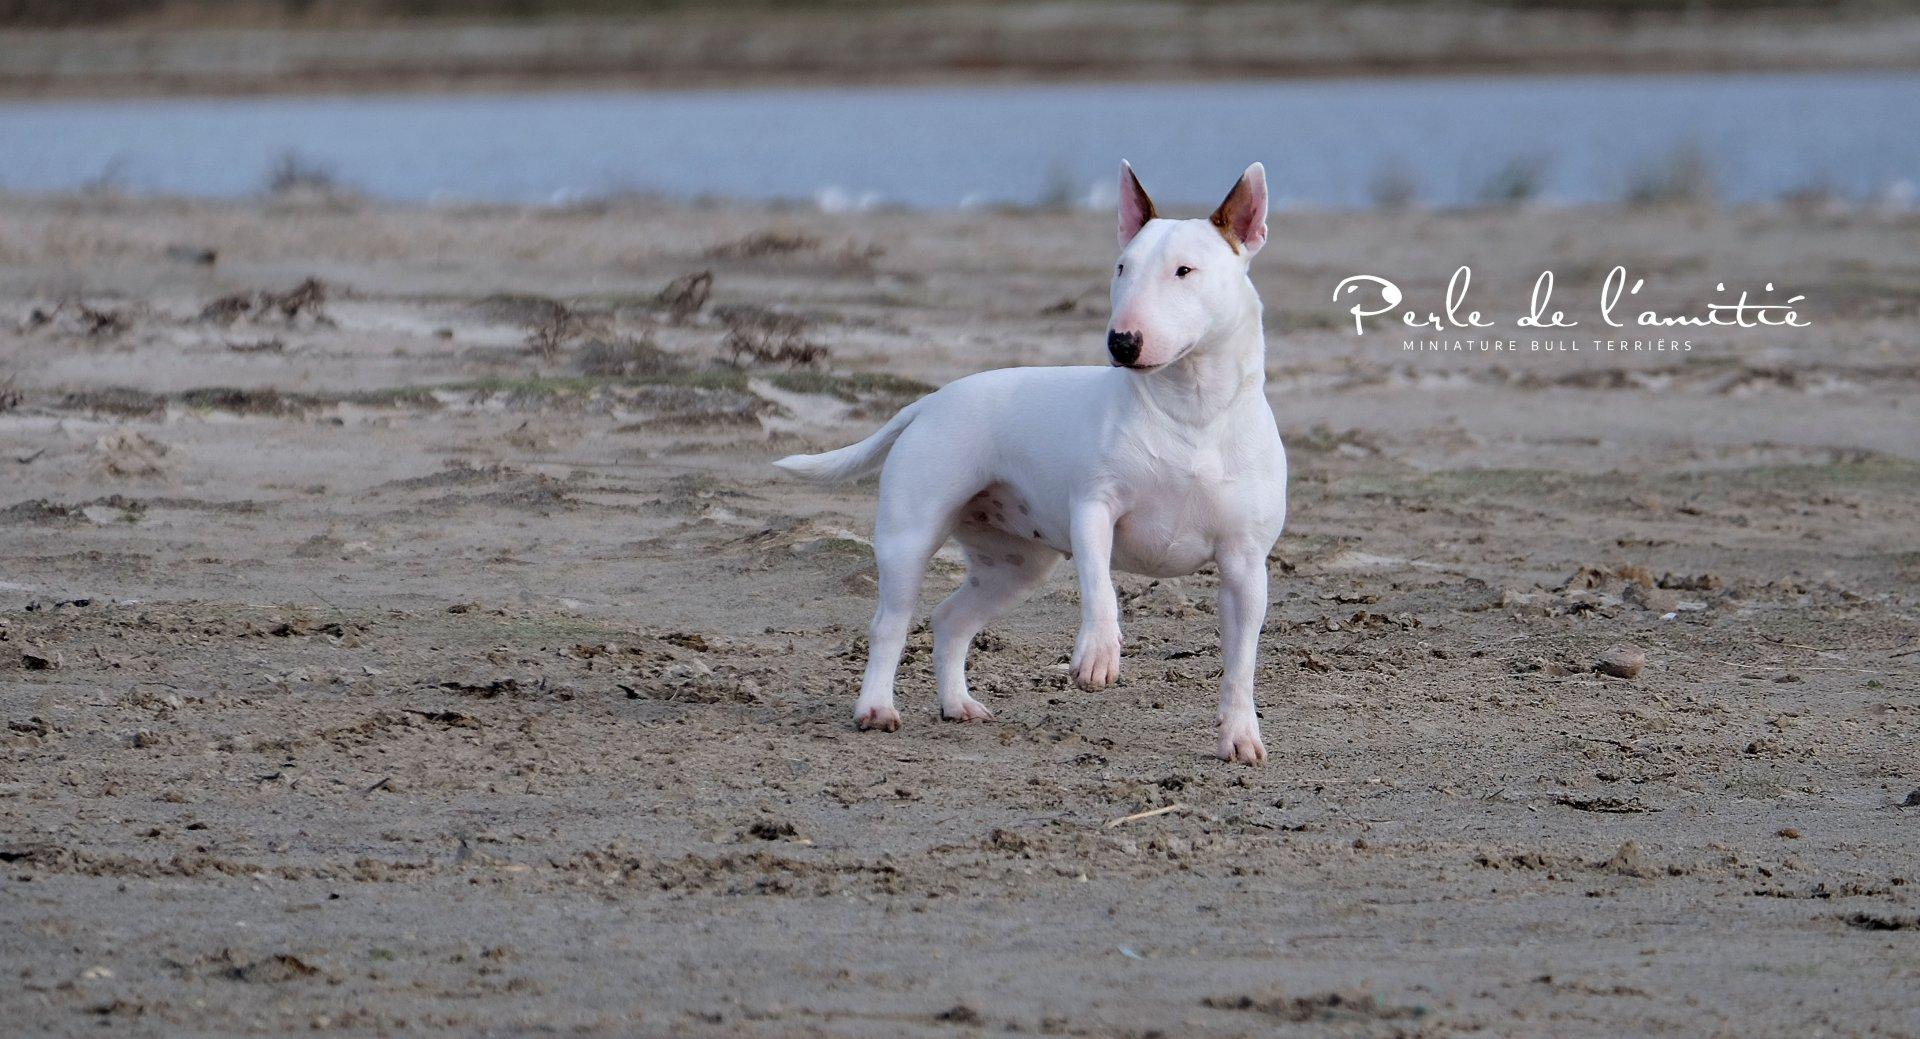 Miniatuur Bull Terriërs | Kennel Limburg Belgium - MBT breeding